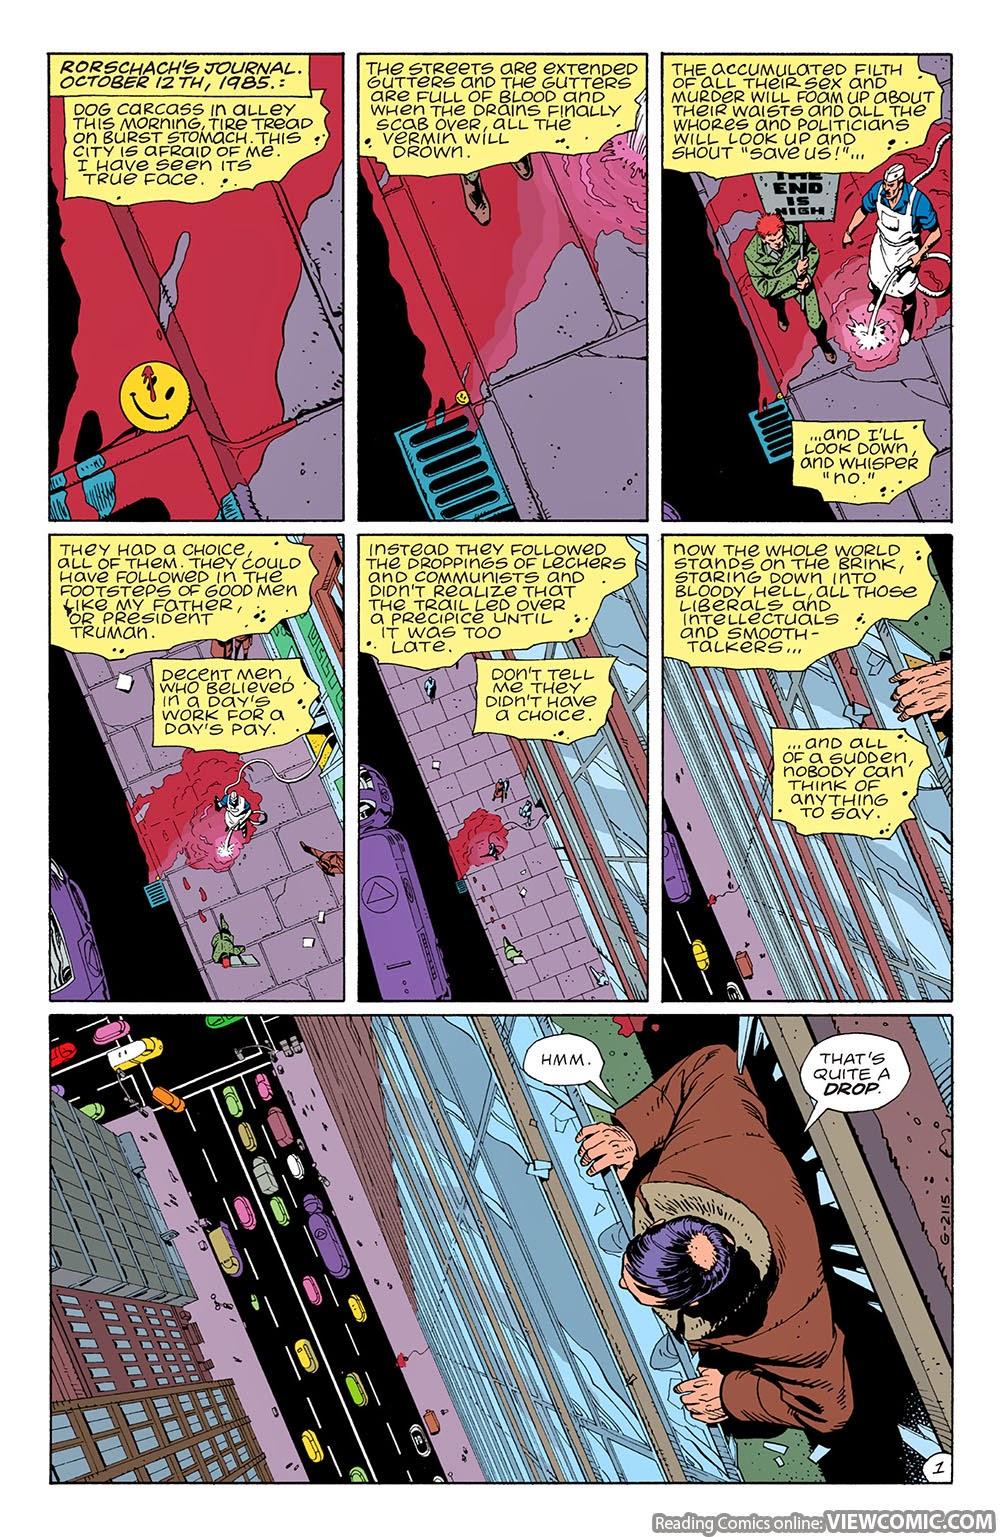 Watchmen 01 …………………………………… | Viewcomic reading comics online